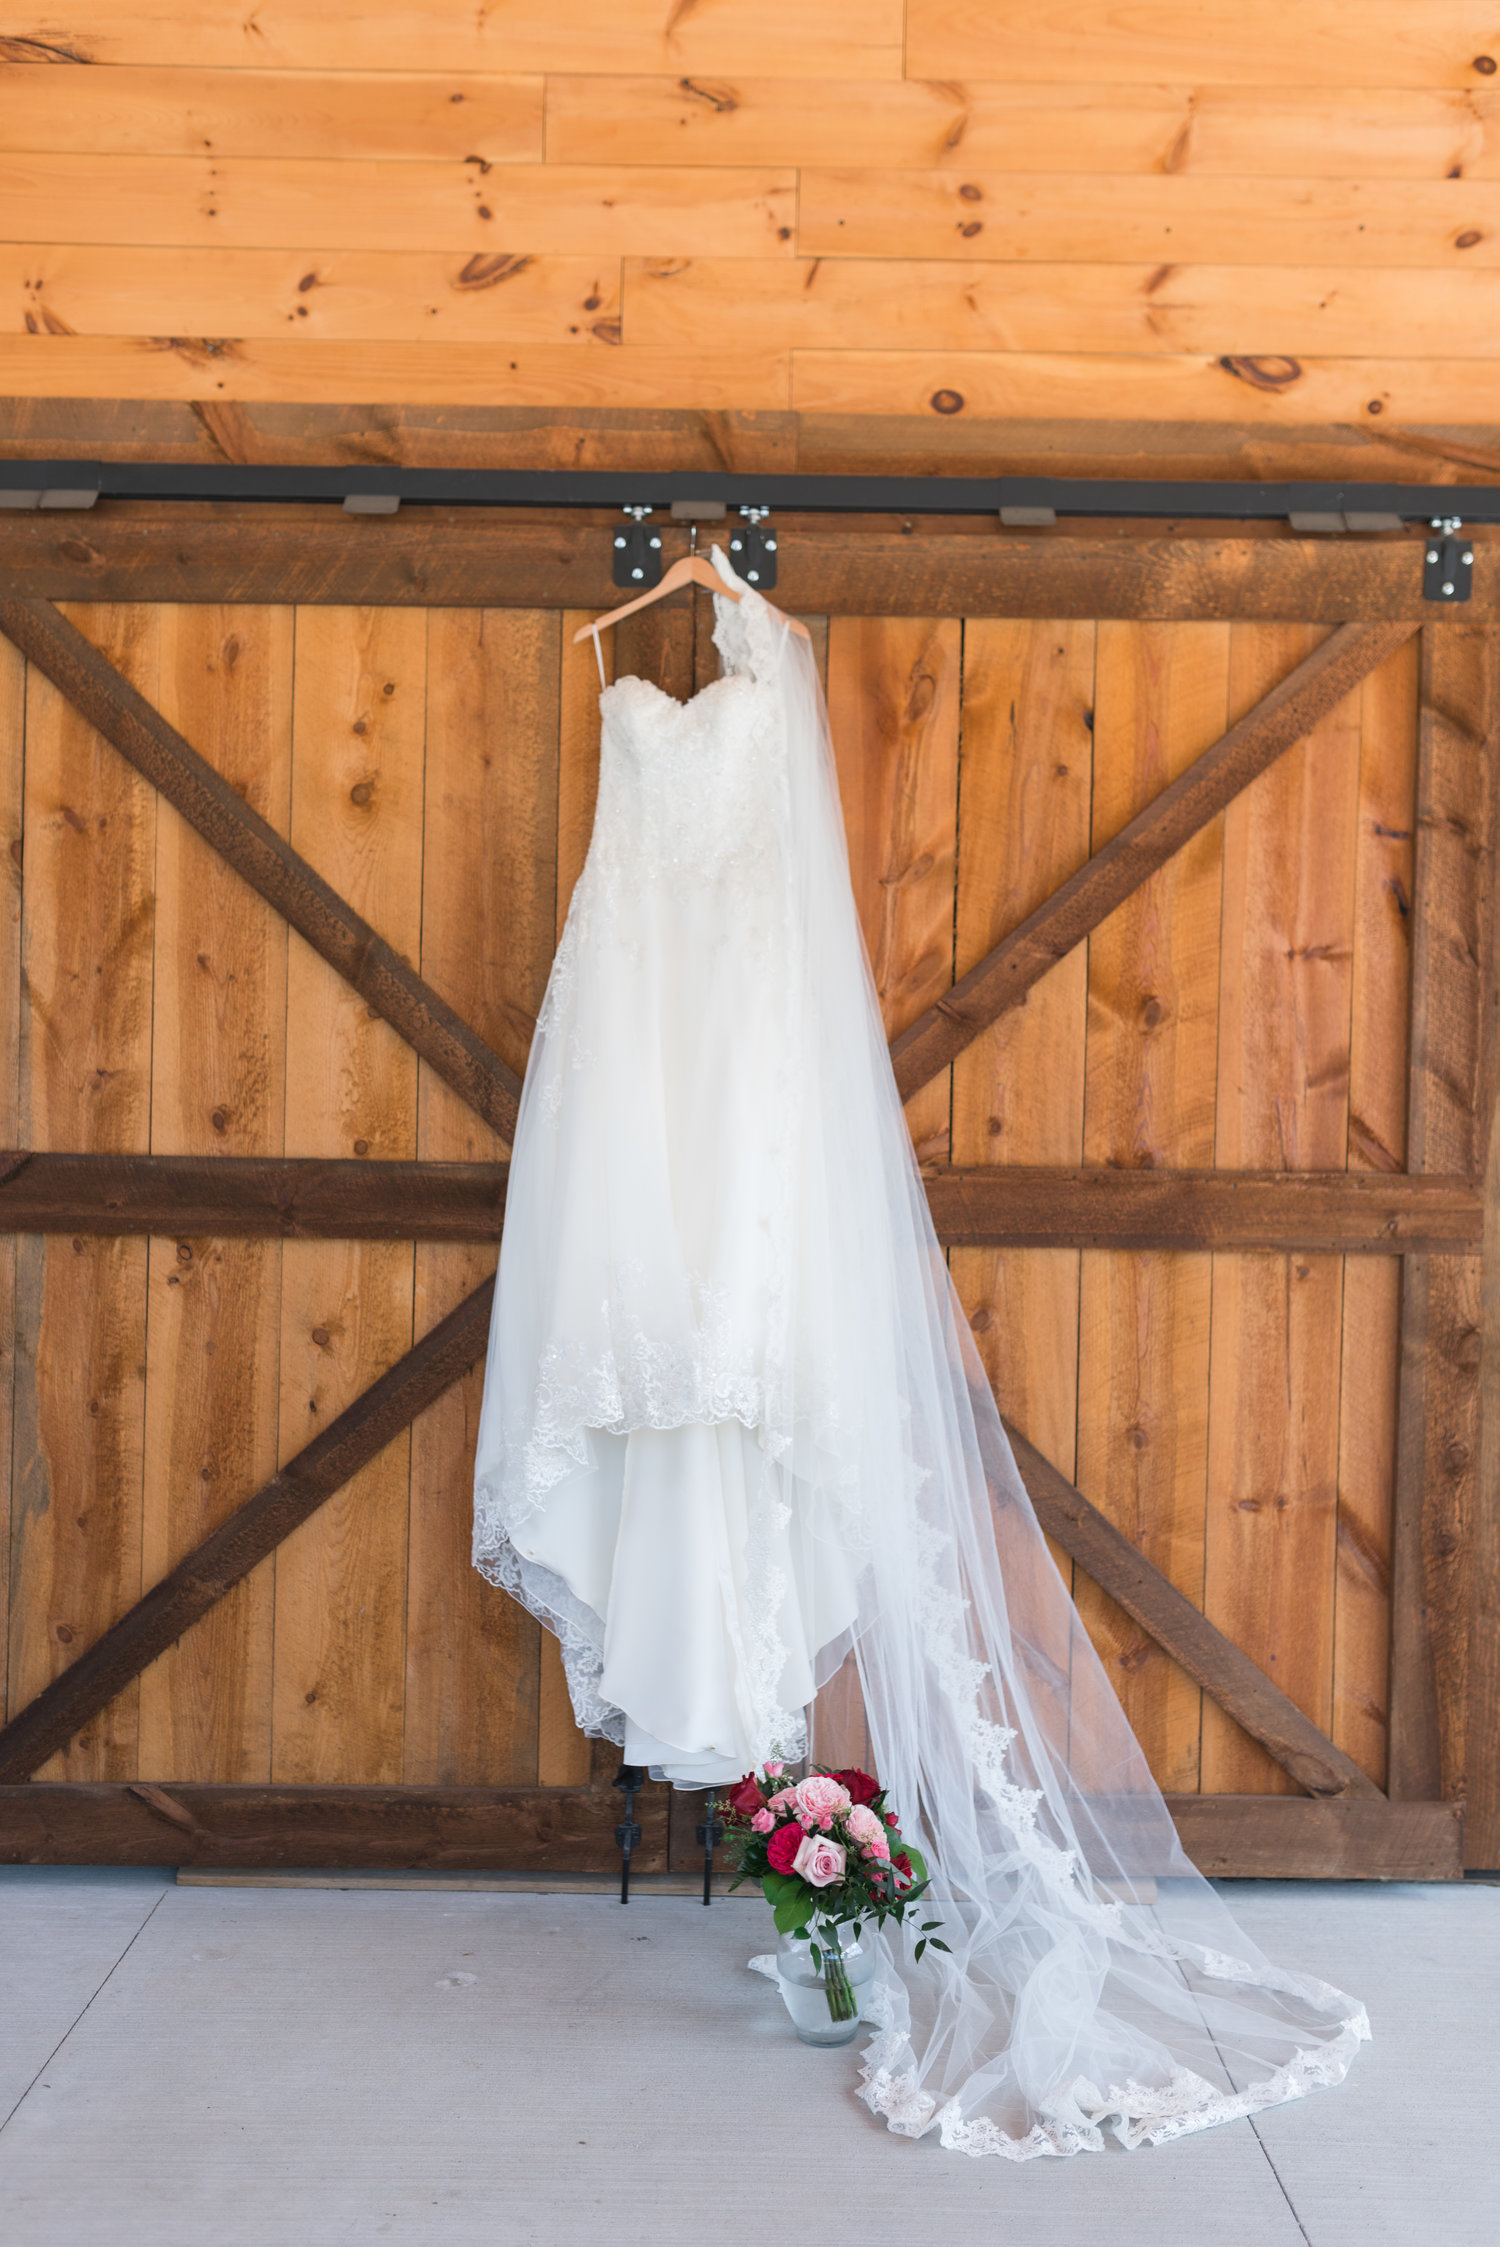 wedding dress, long veil, and wedding flowers in glass vase in front of barn door in Des Moines iowa